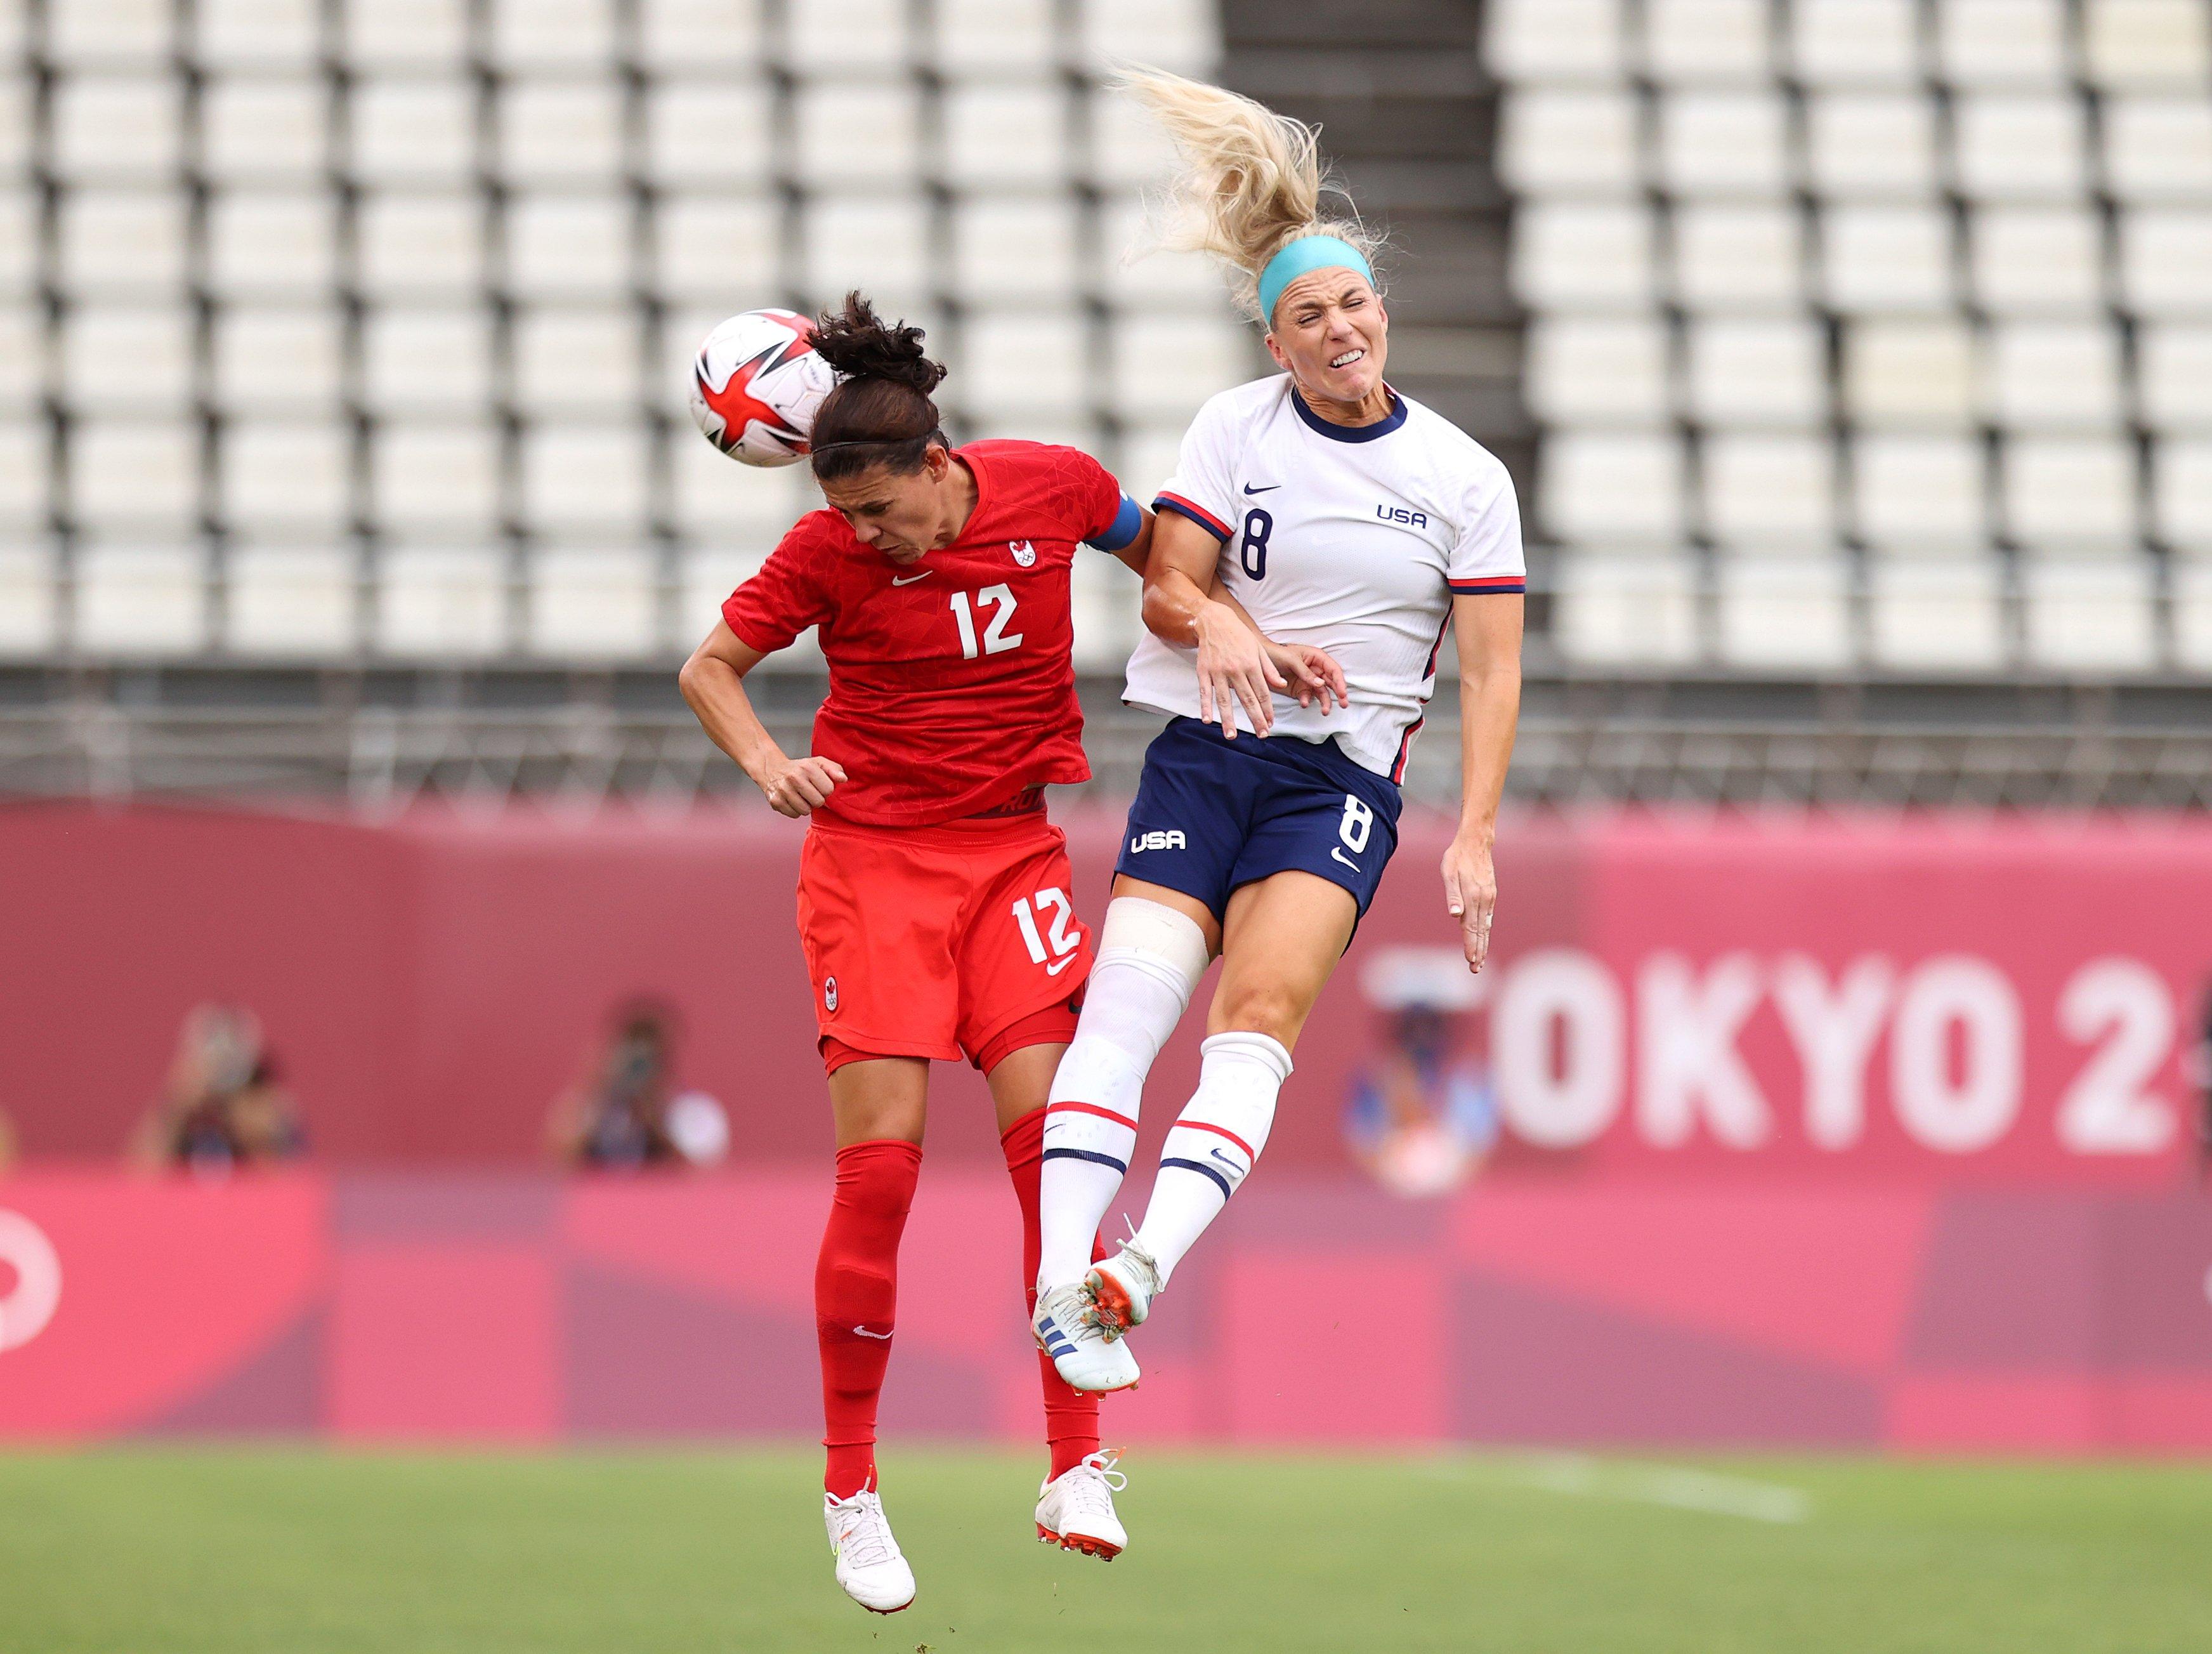 U.S. women's soccer takes on Canada in Olympic soccer semi-final